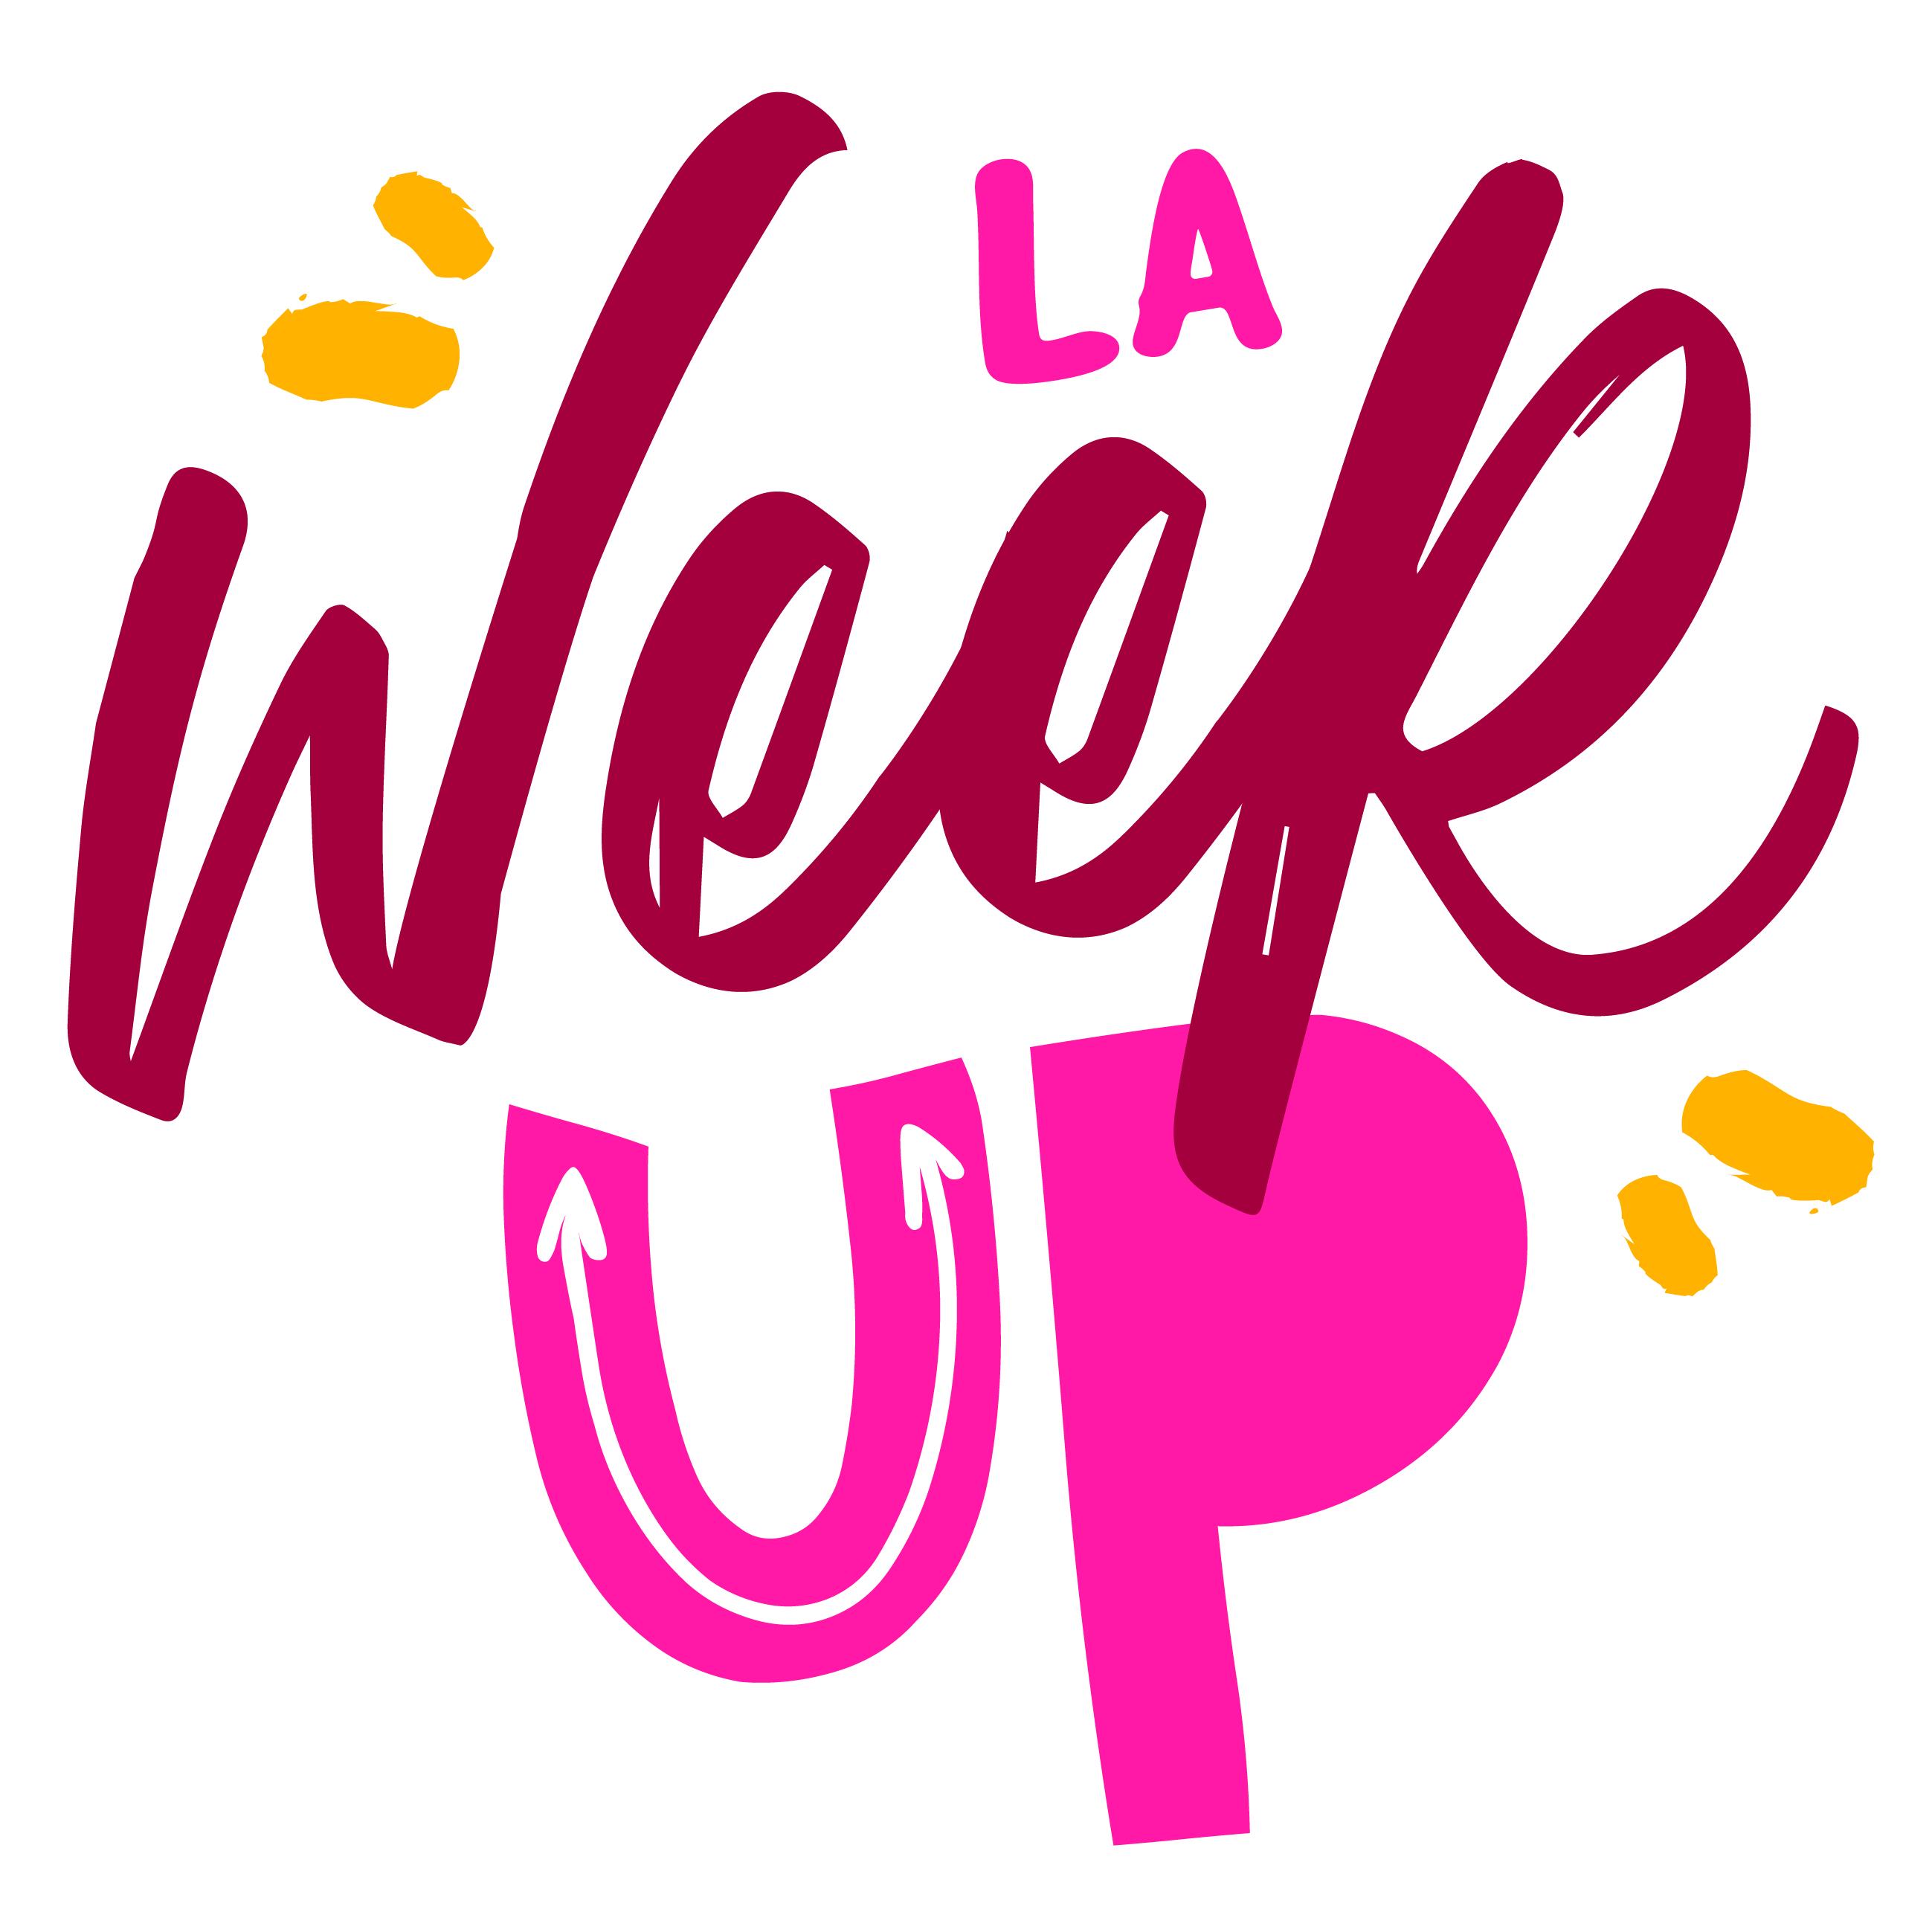 LA WEEK' UP